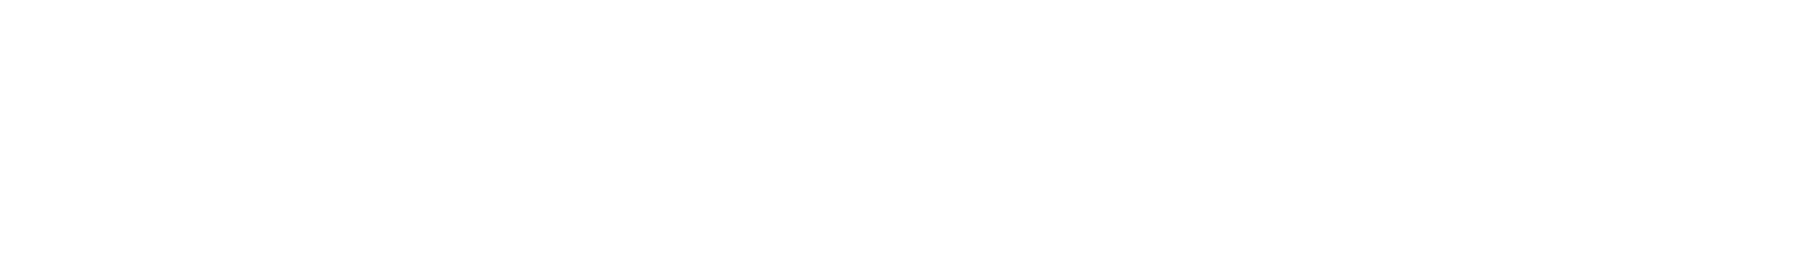 vocoder 2   frequency